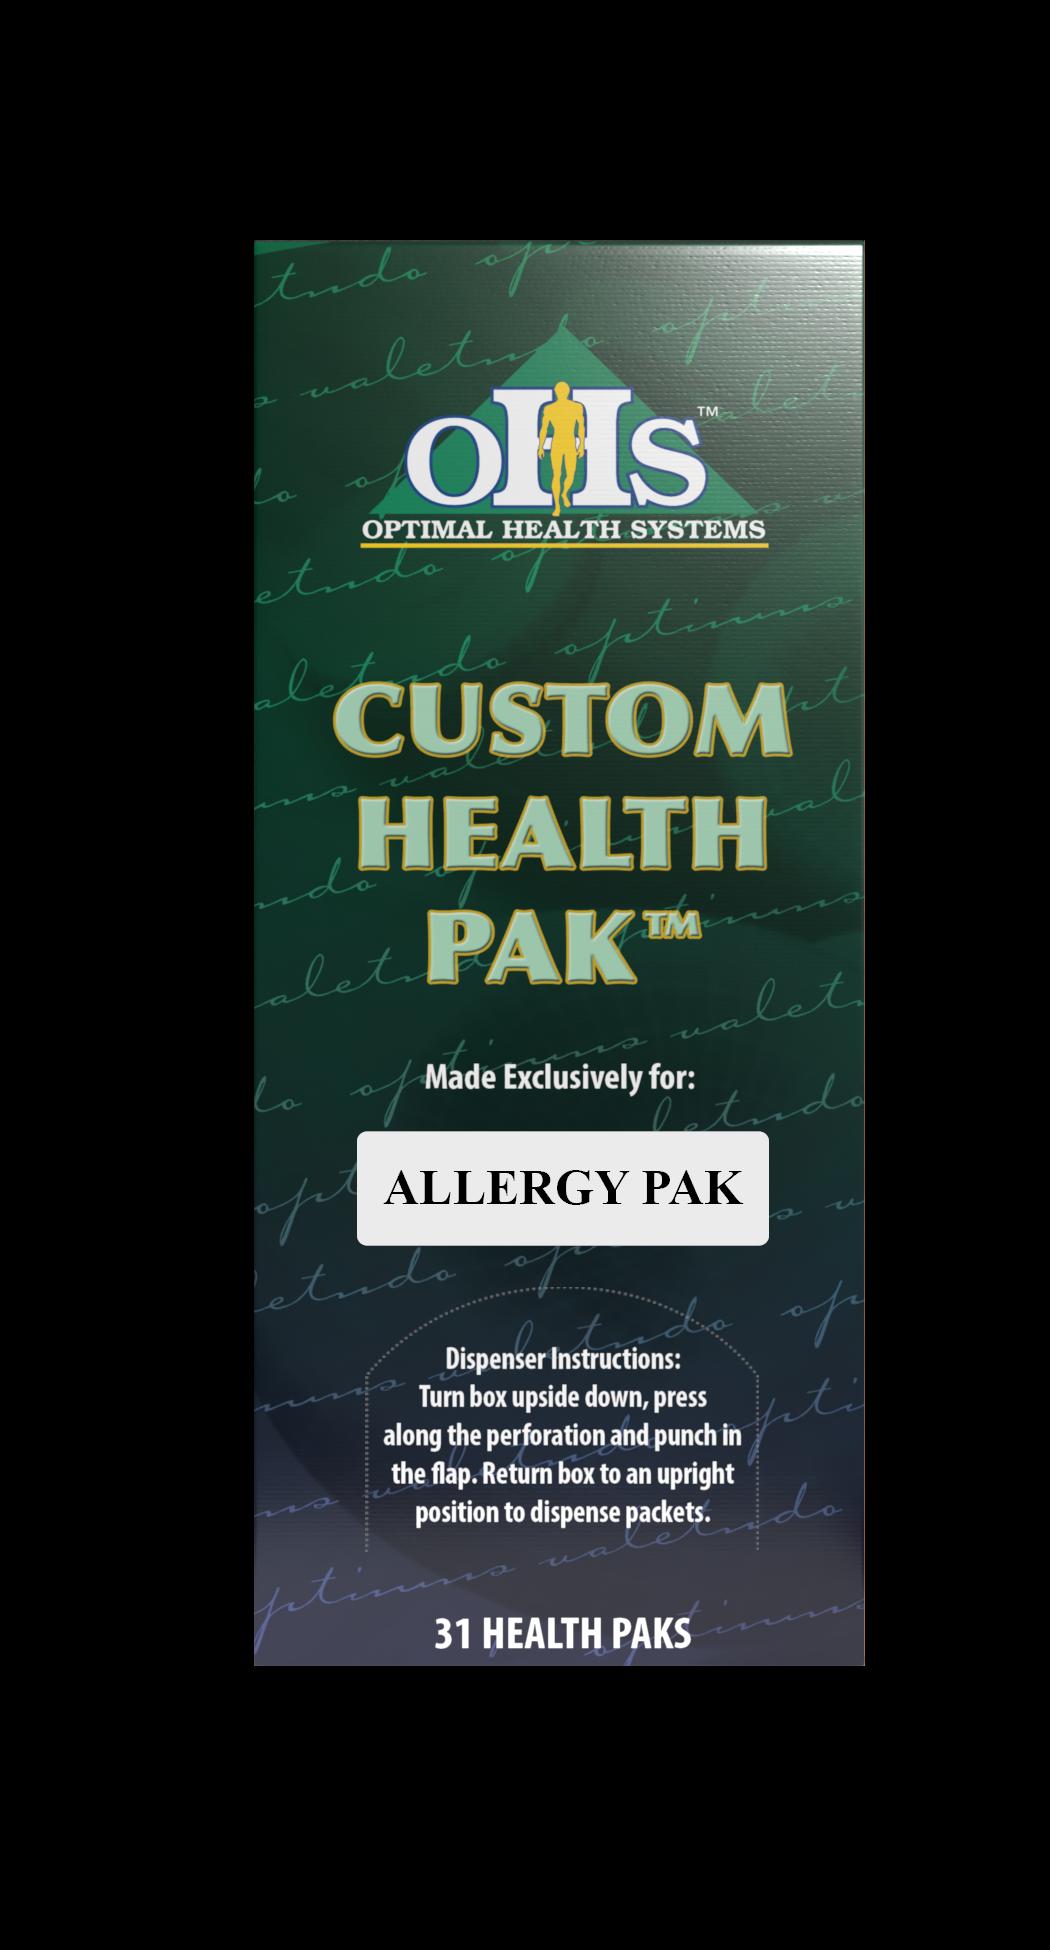 Allergy Pak